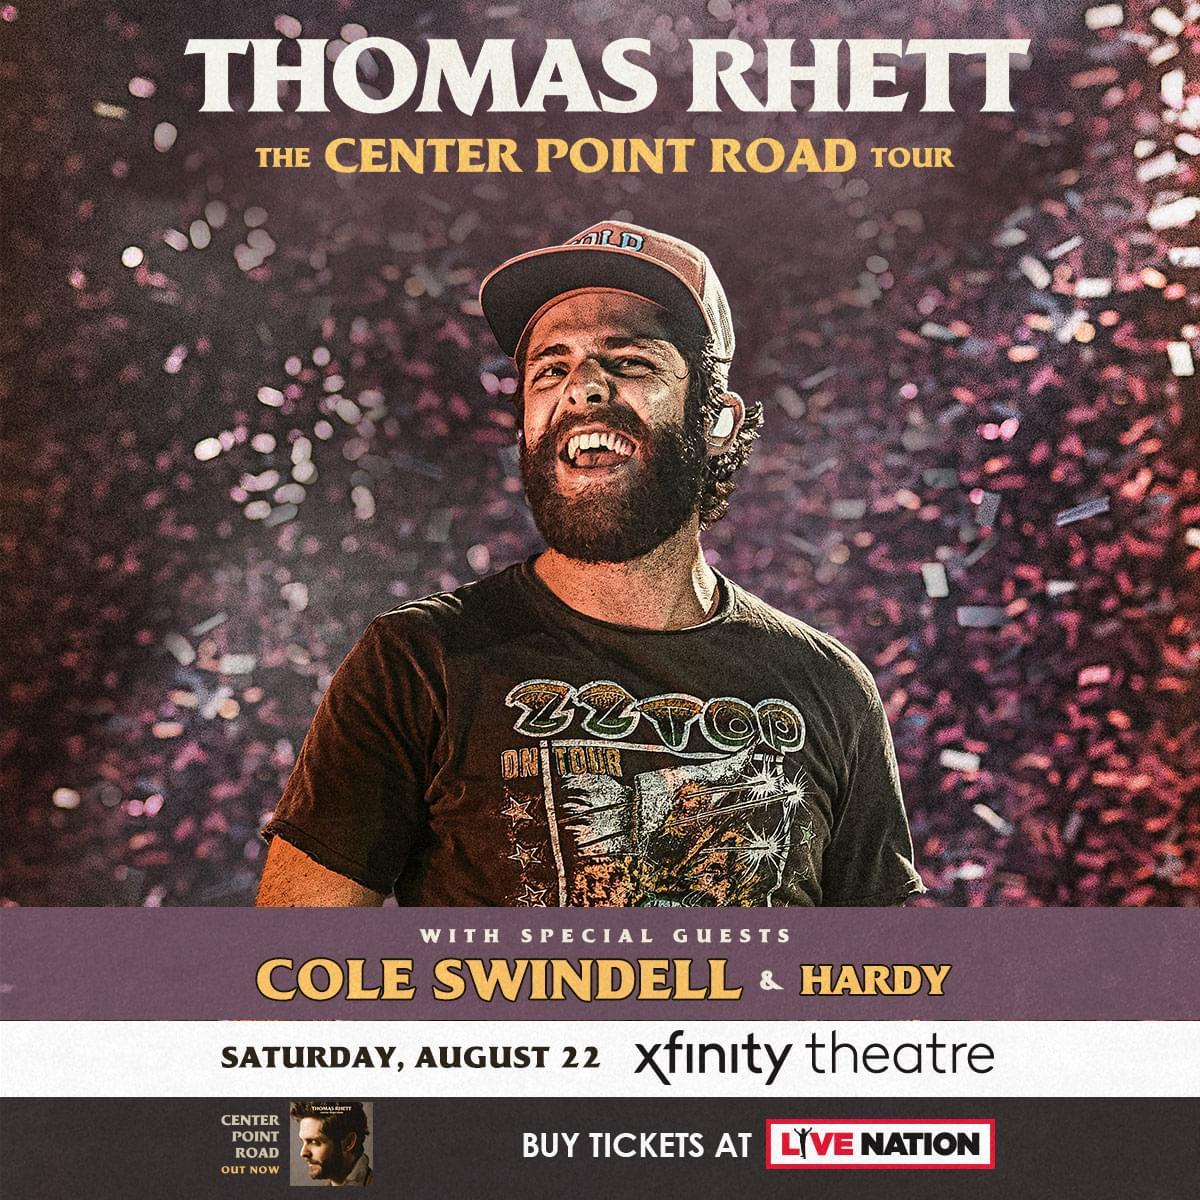 Enter to win tickets to Thomas Rhett